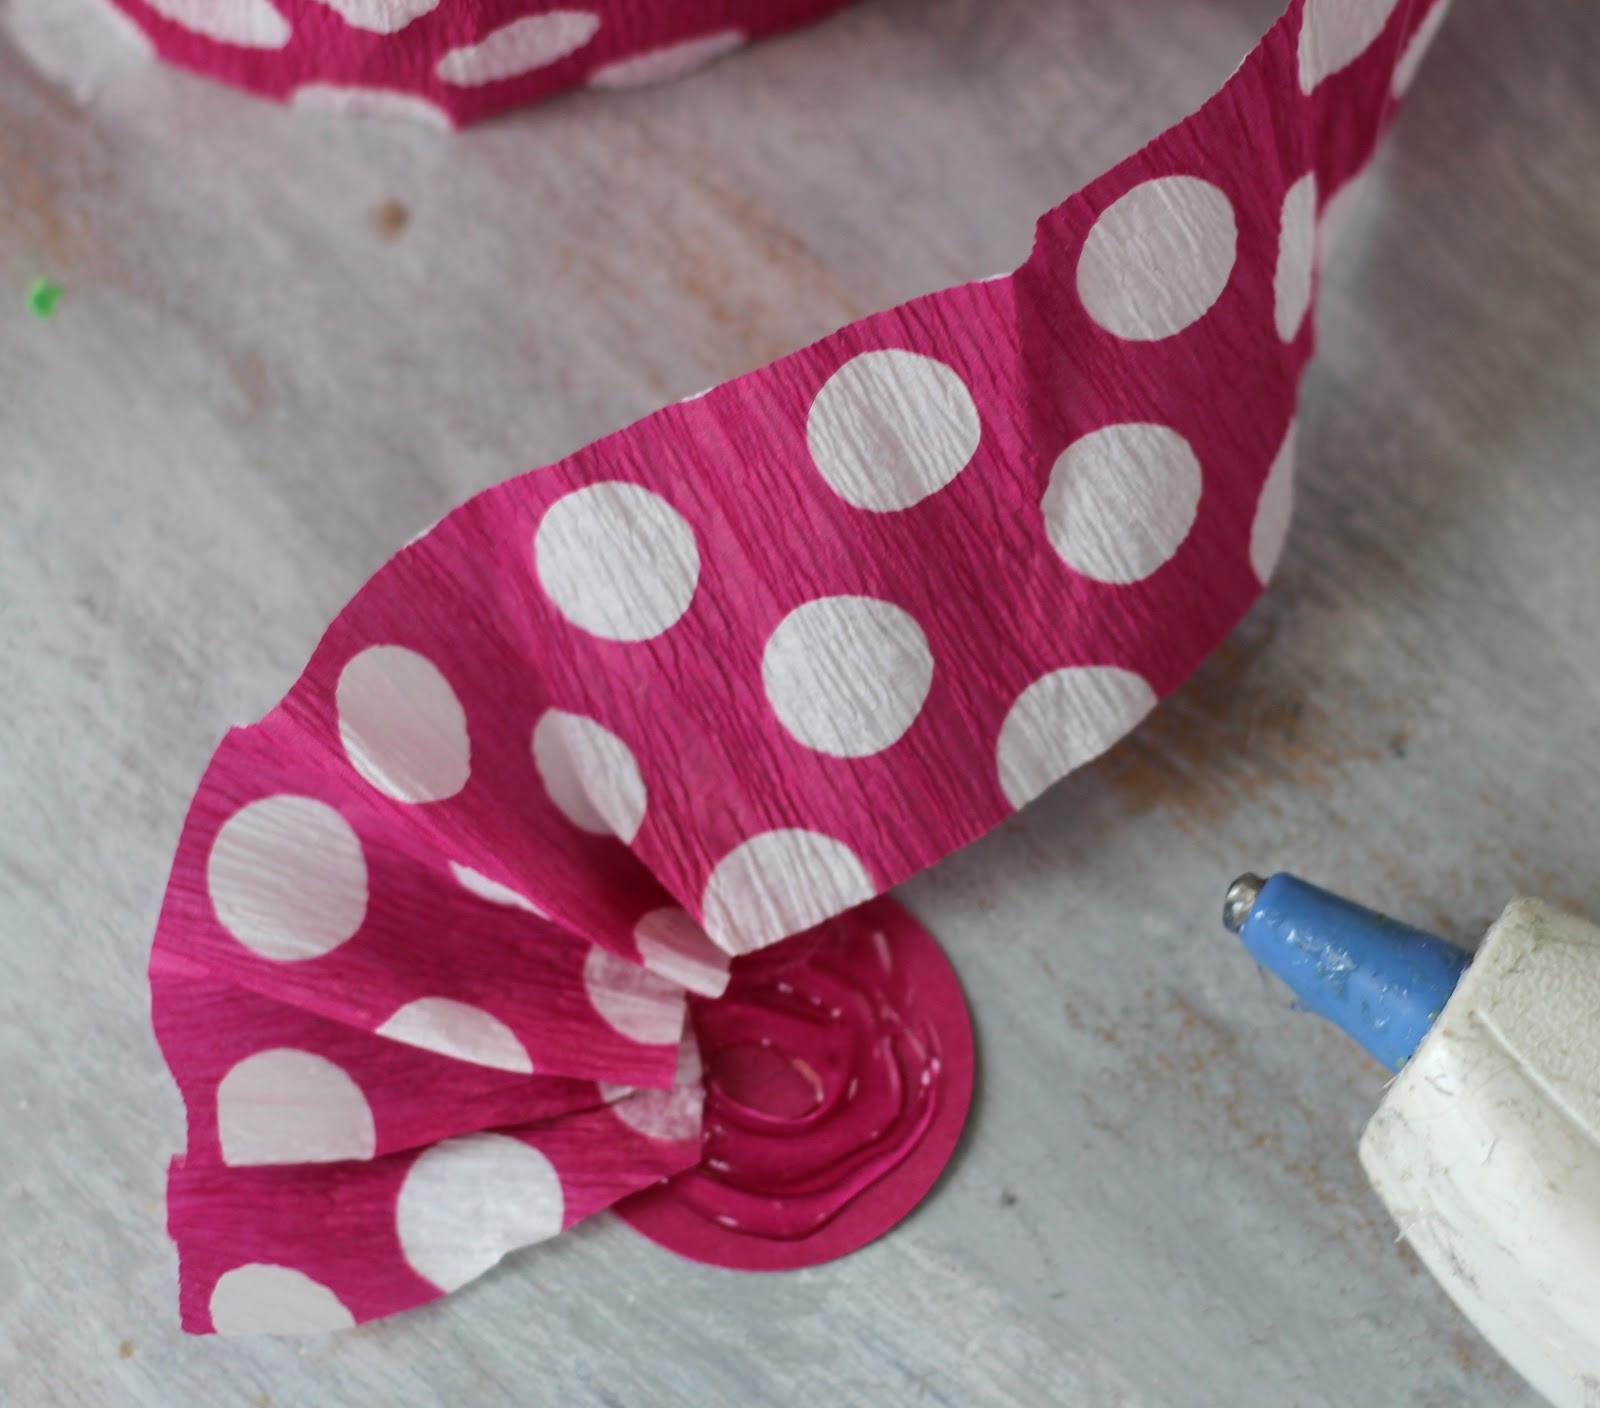 How to scrapbook flowers - How To Make Crepe Paper Flowers Todayscreativeblog Net